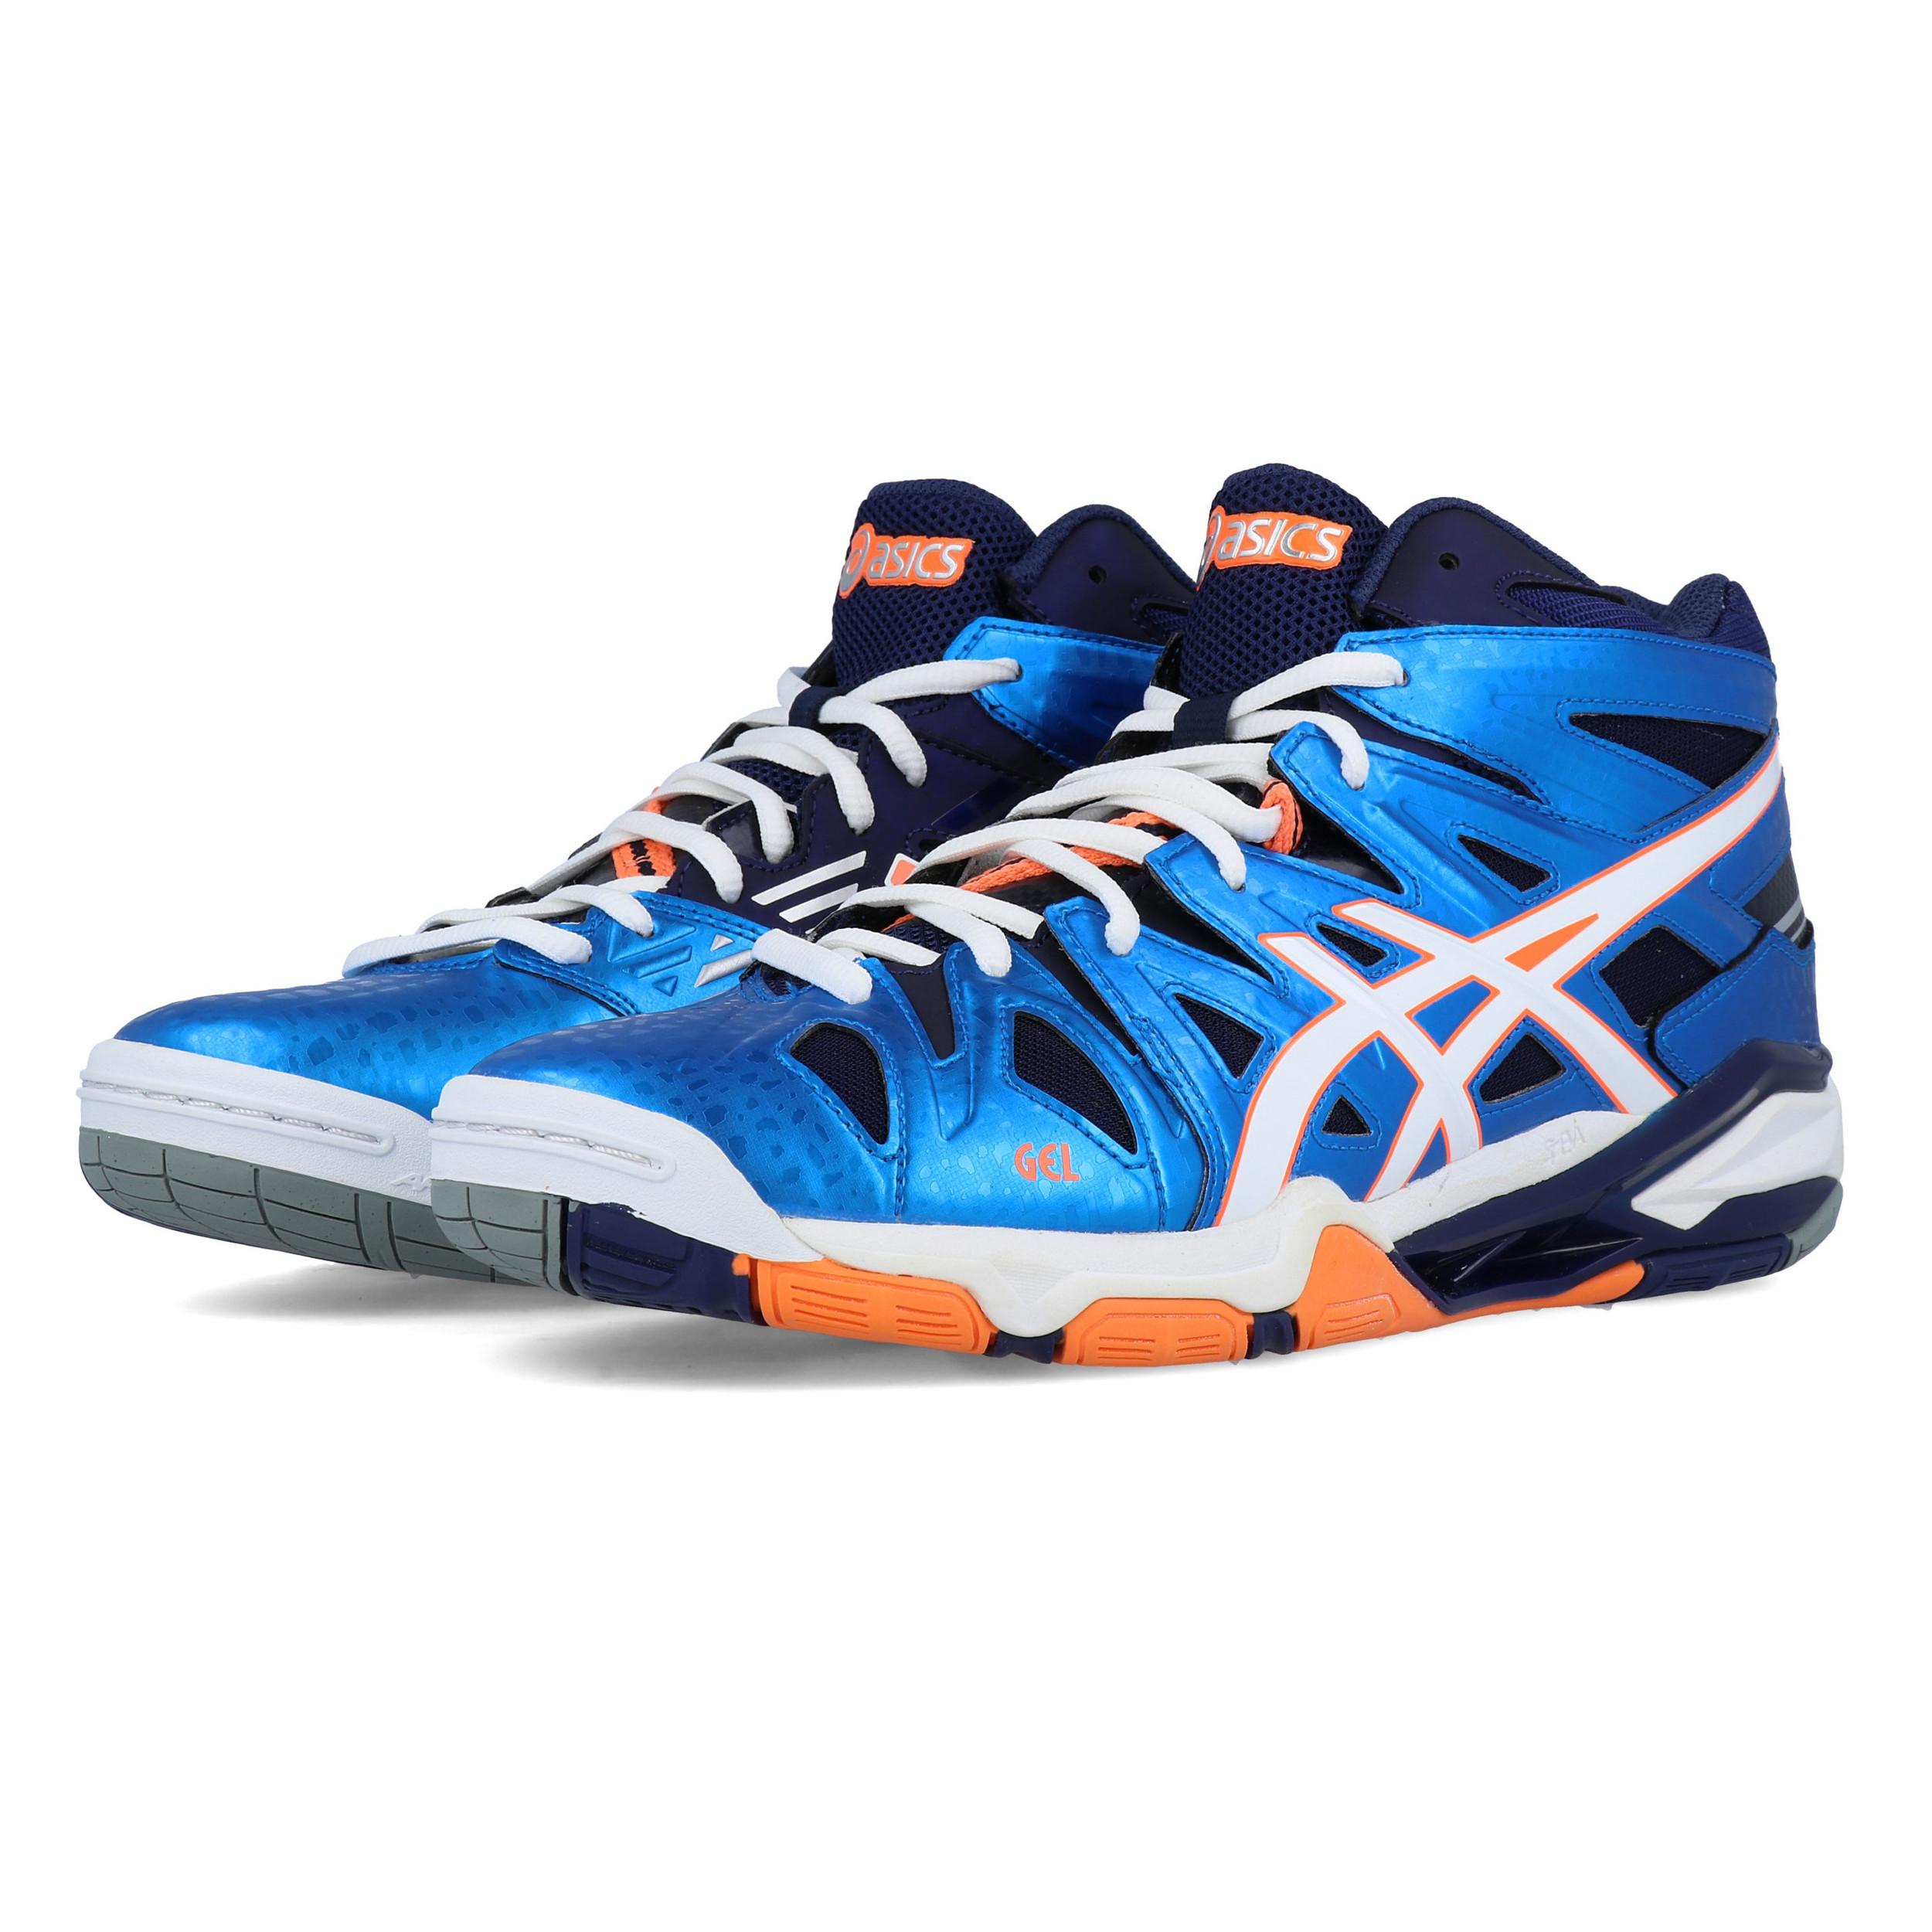 Details zu Asics Mens Gel Sensei 5 MT Indoor Court Shoe Blue White Sports Netball